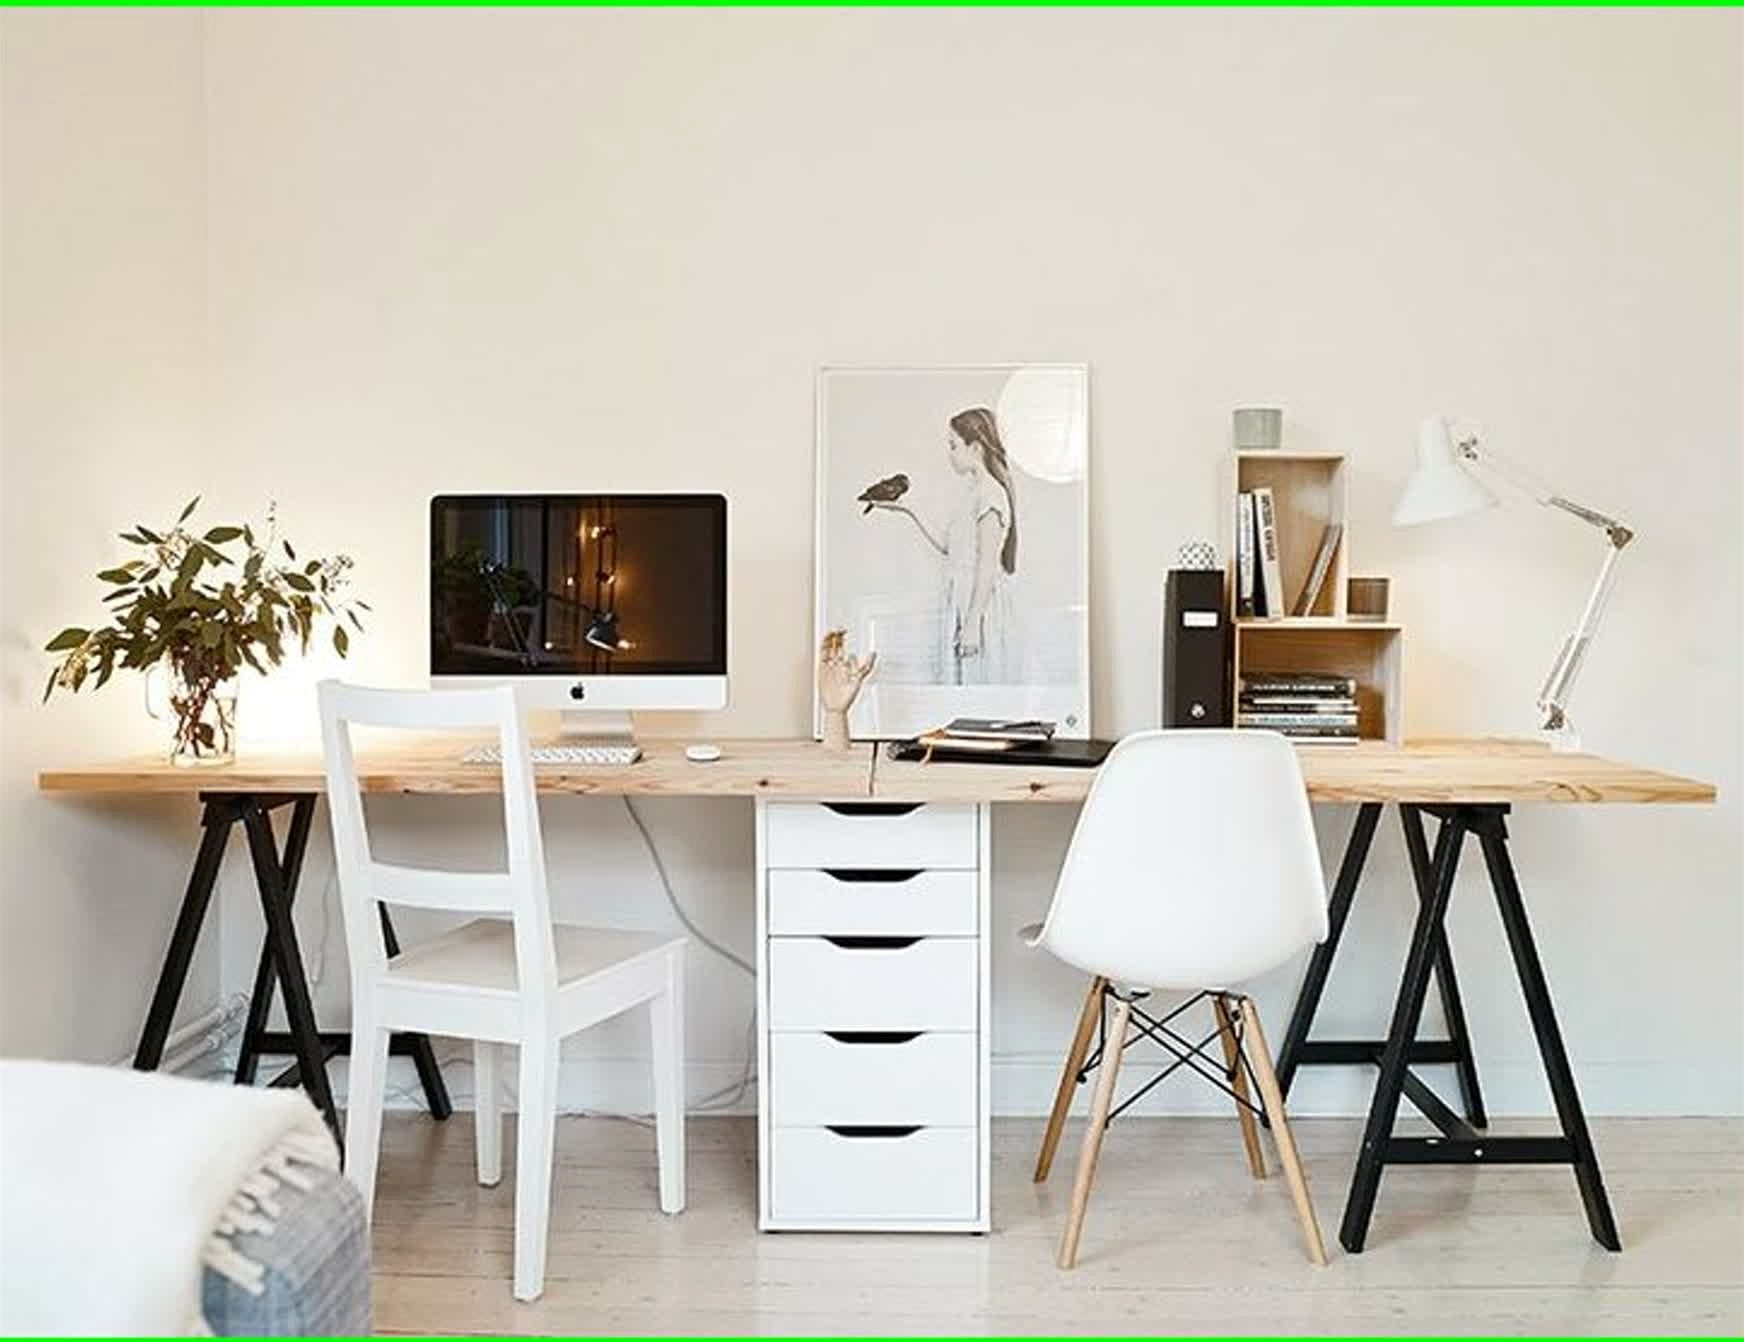 Ikea Ufficio In Casa : Idee arredamento casa idee ufficio ikea innovative ikea tavolo